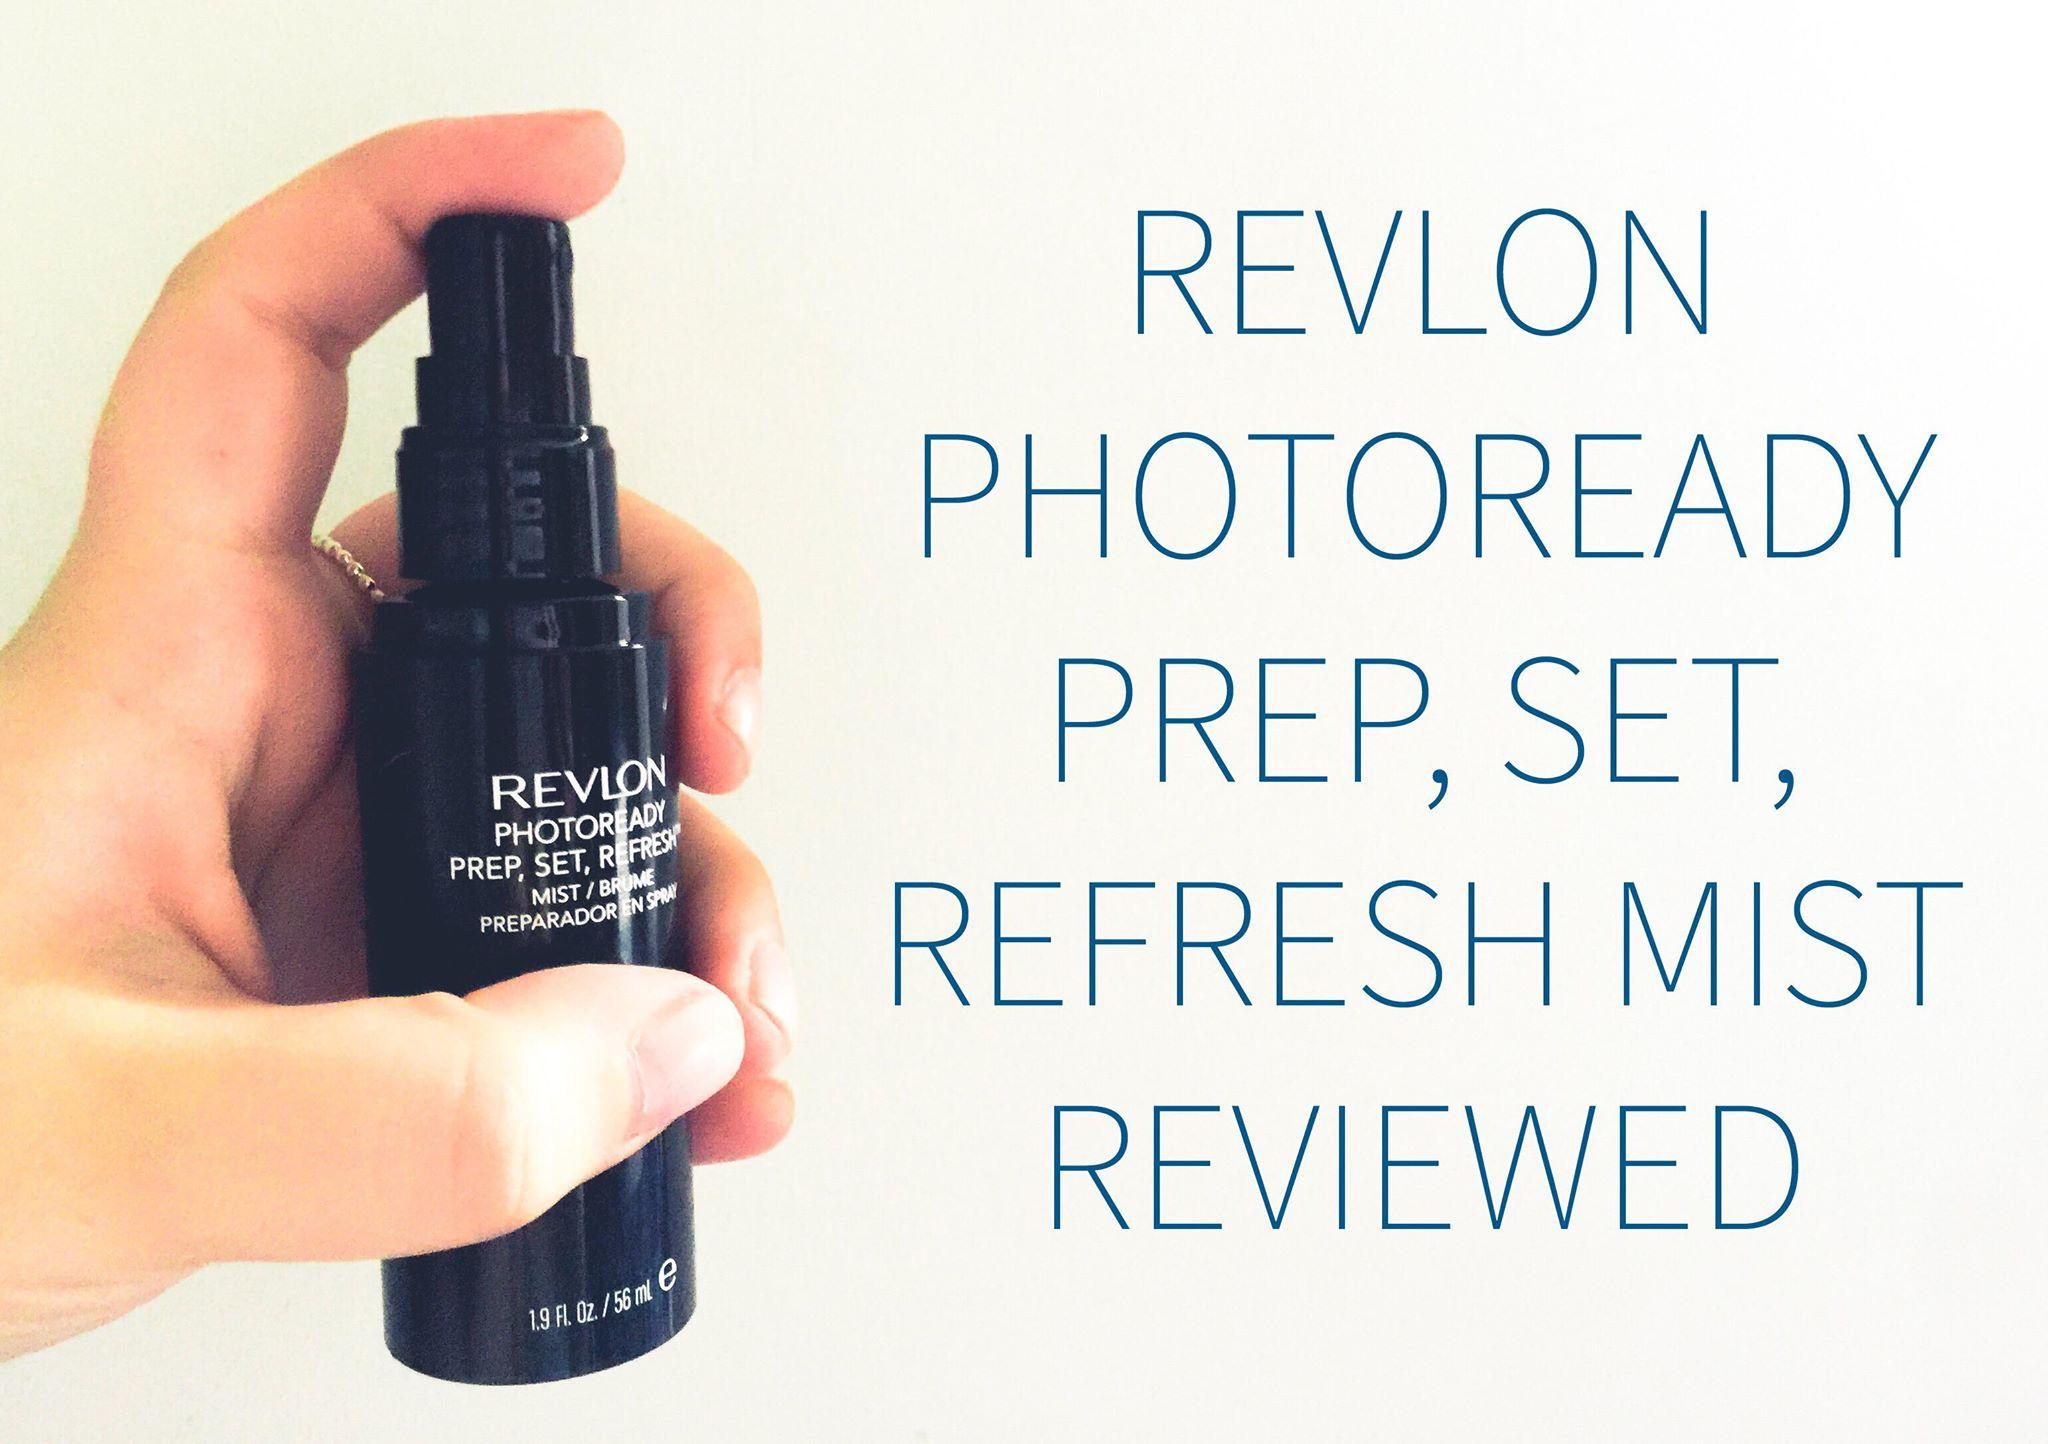 revlon prep set refresh mist reviewed